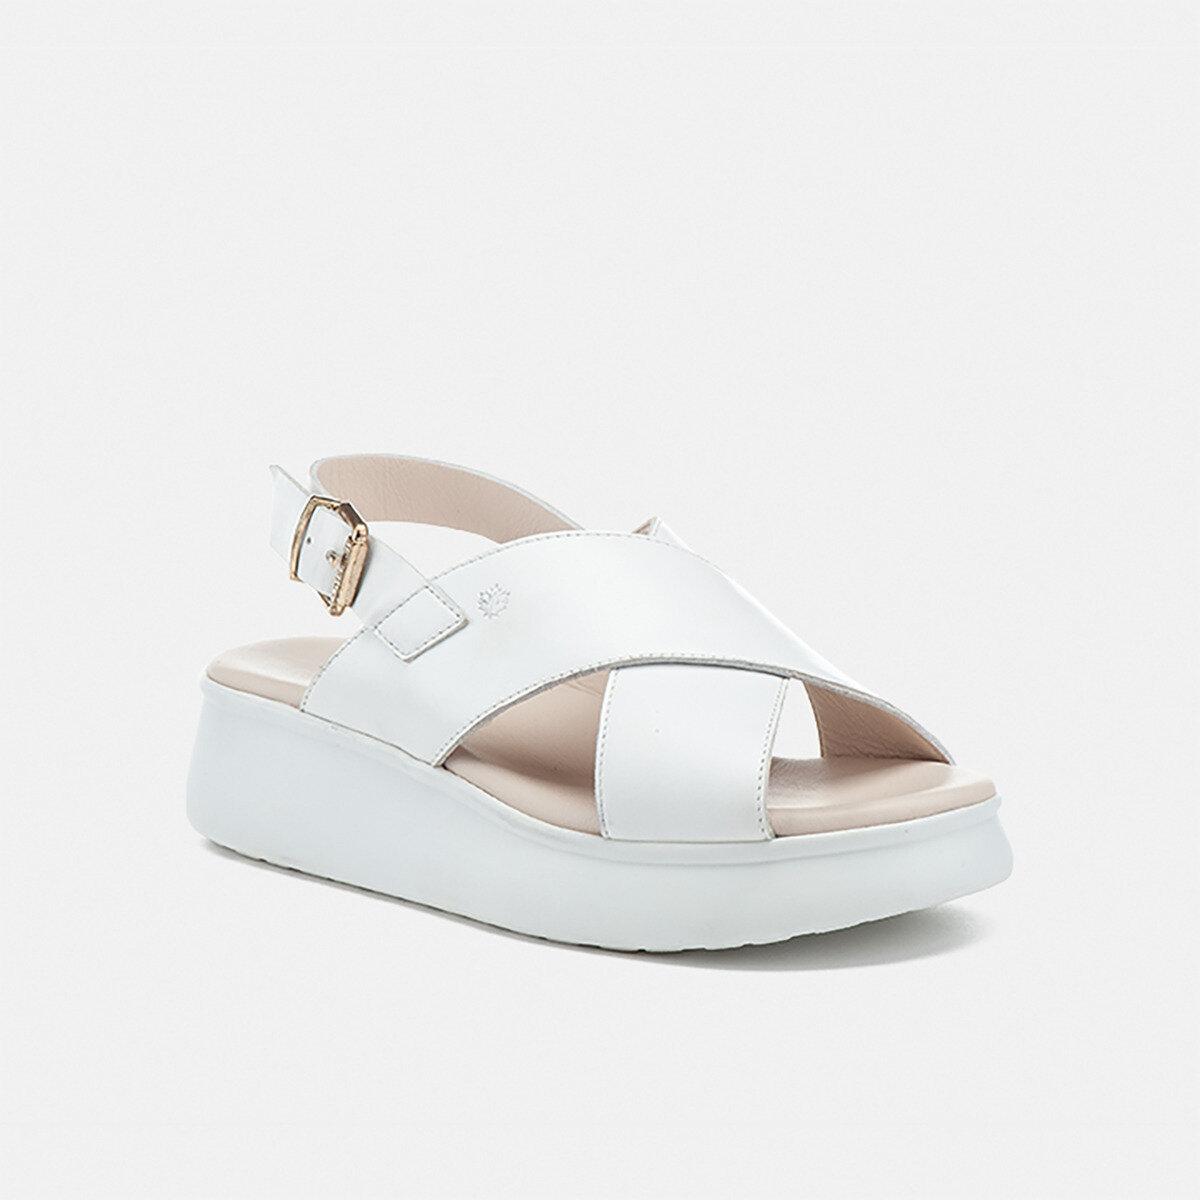 WENDY WHITE Woman Sandals